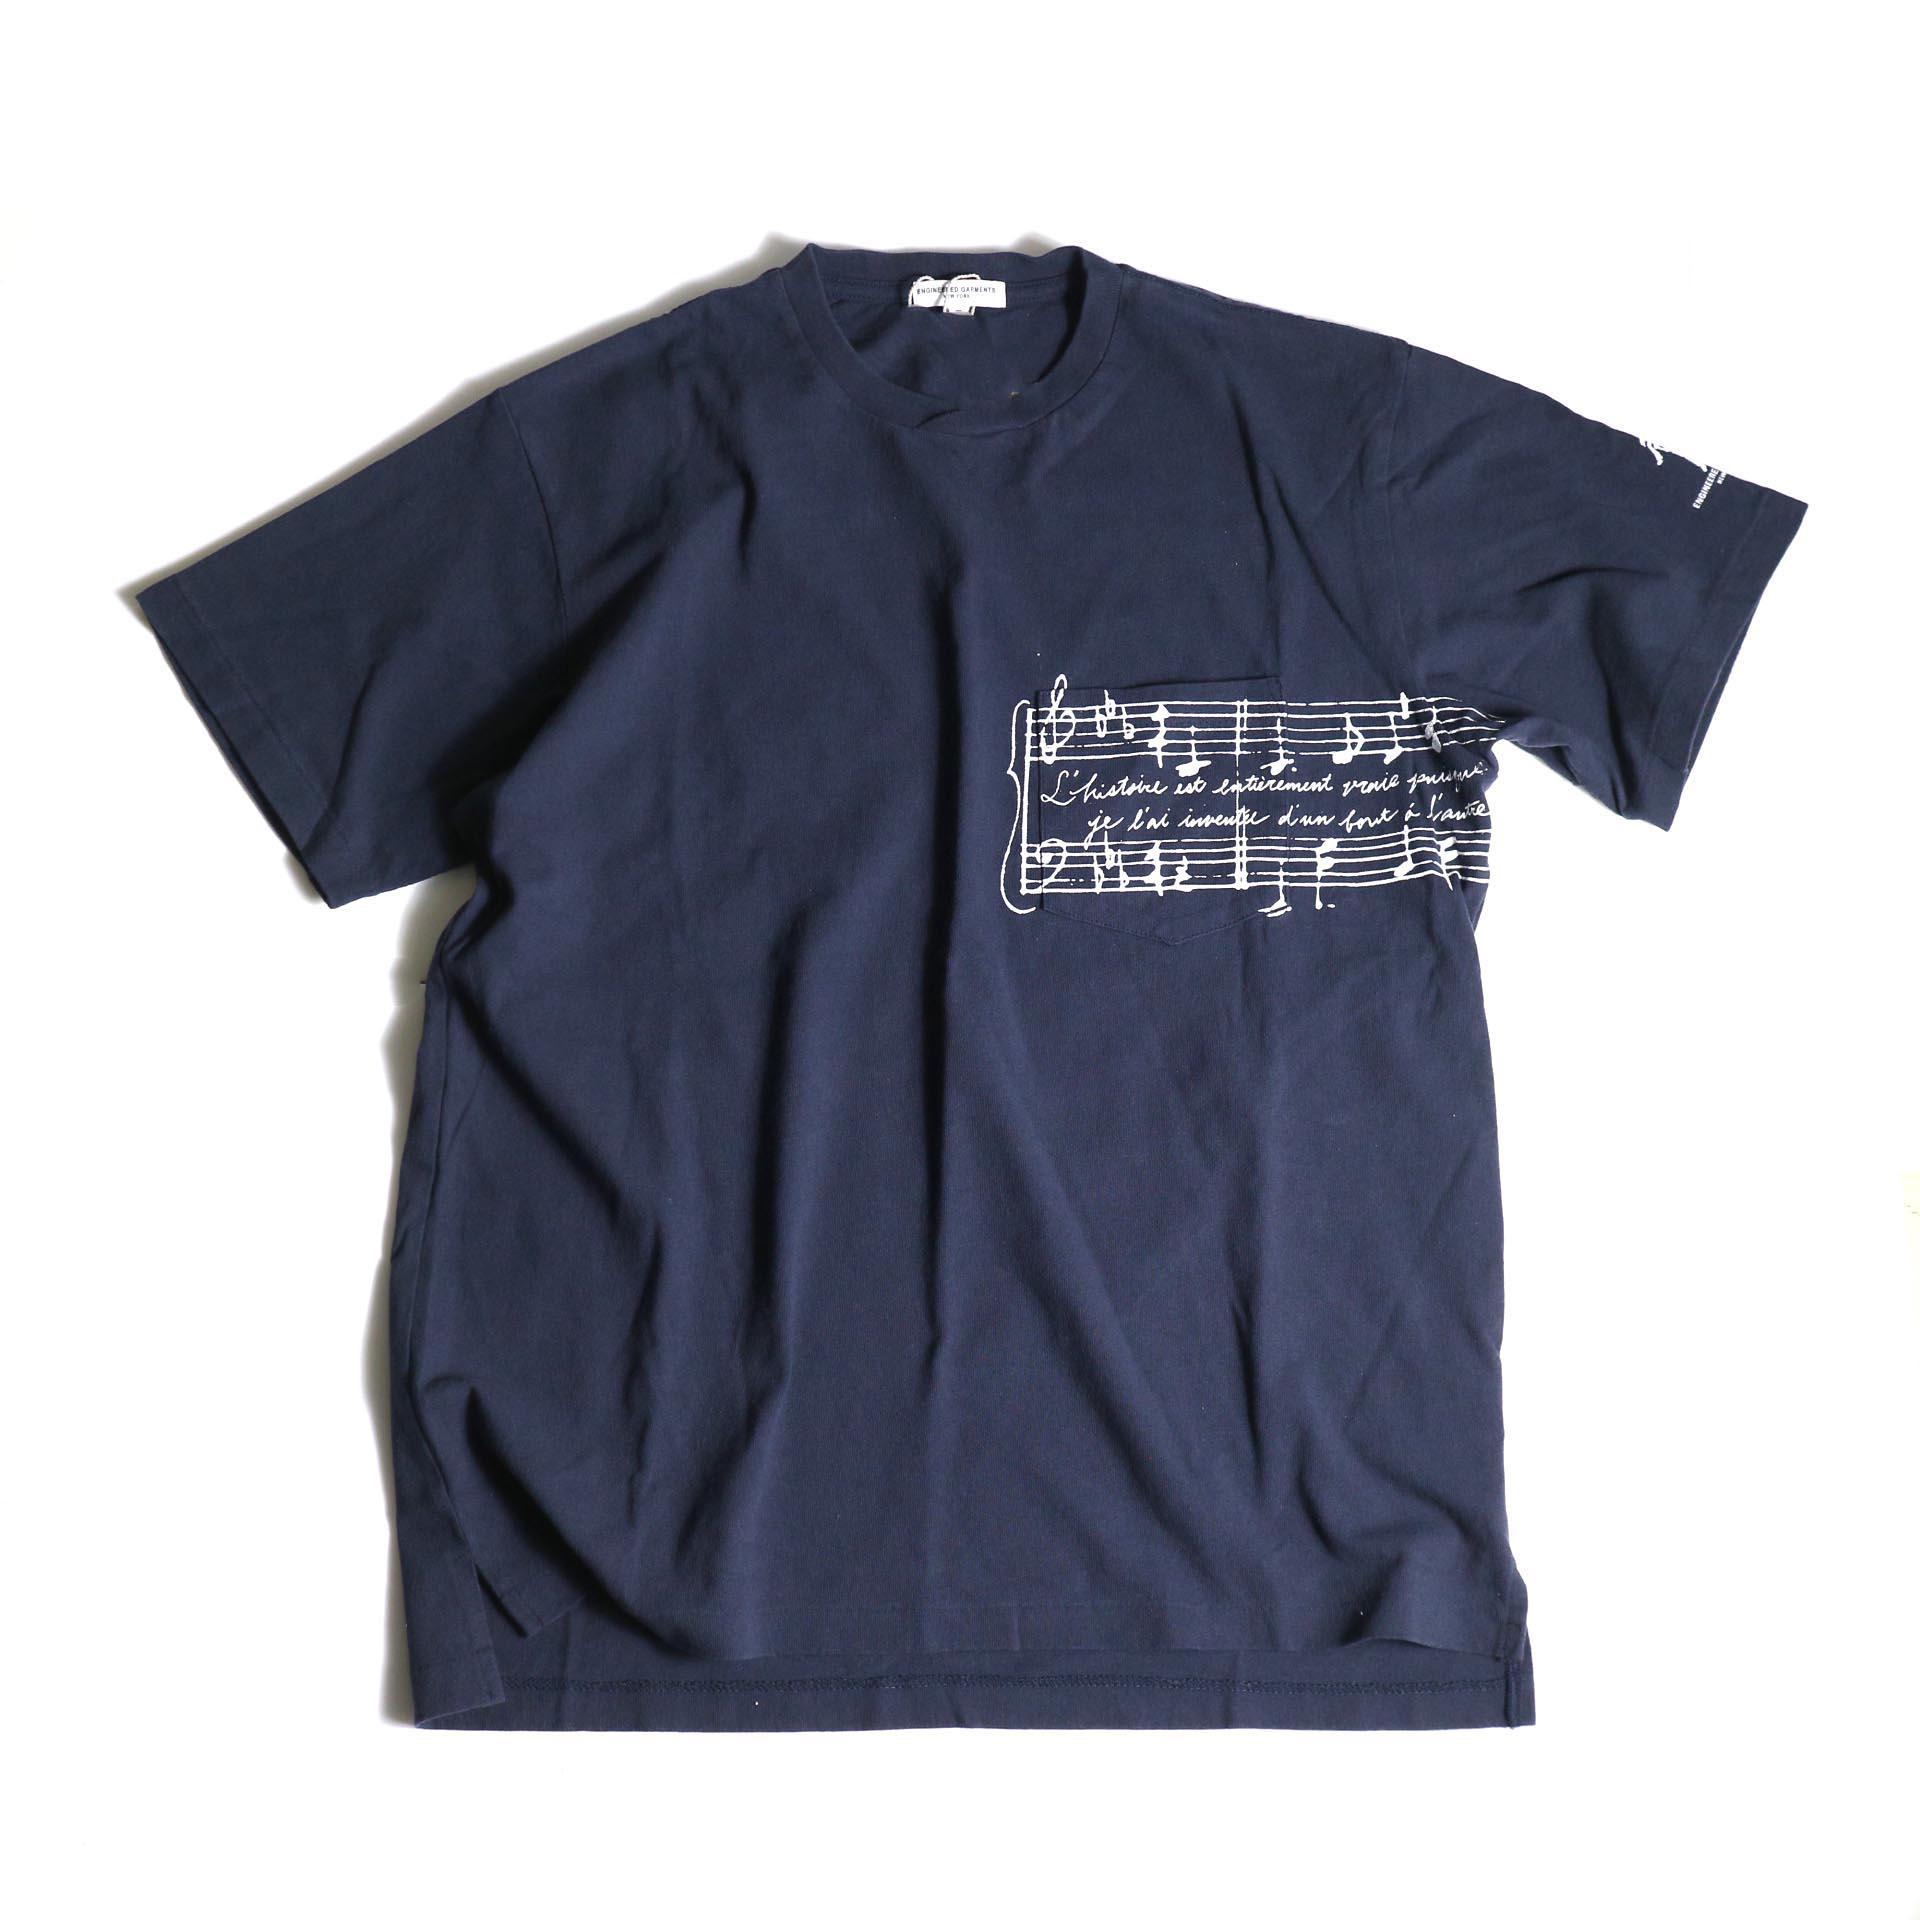 Engineered Garments / Printed Cross Crew Neck T-shirt -Music (Navy)